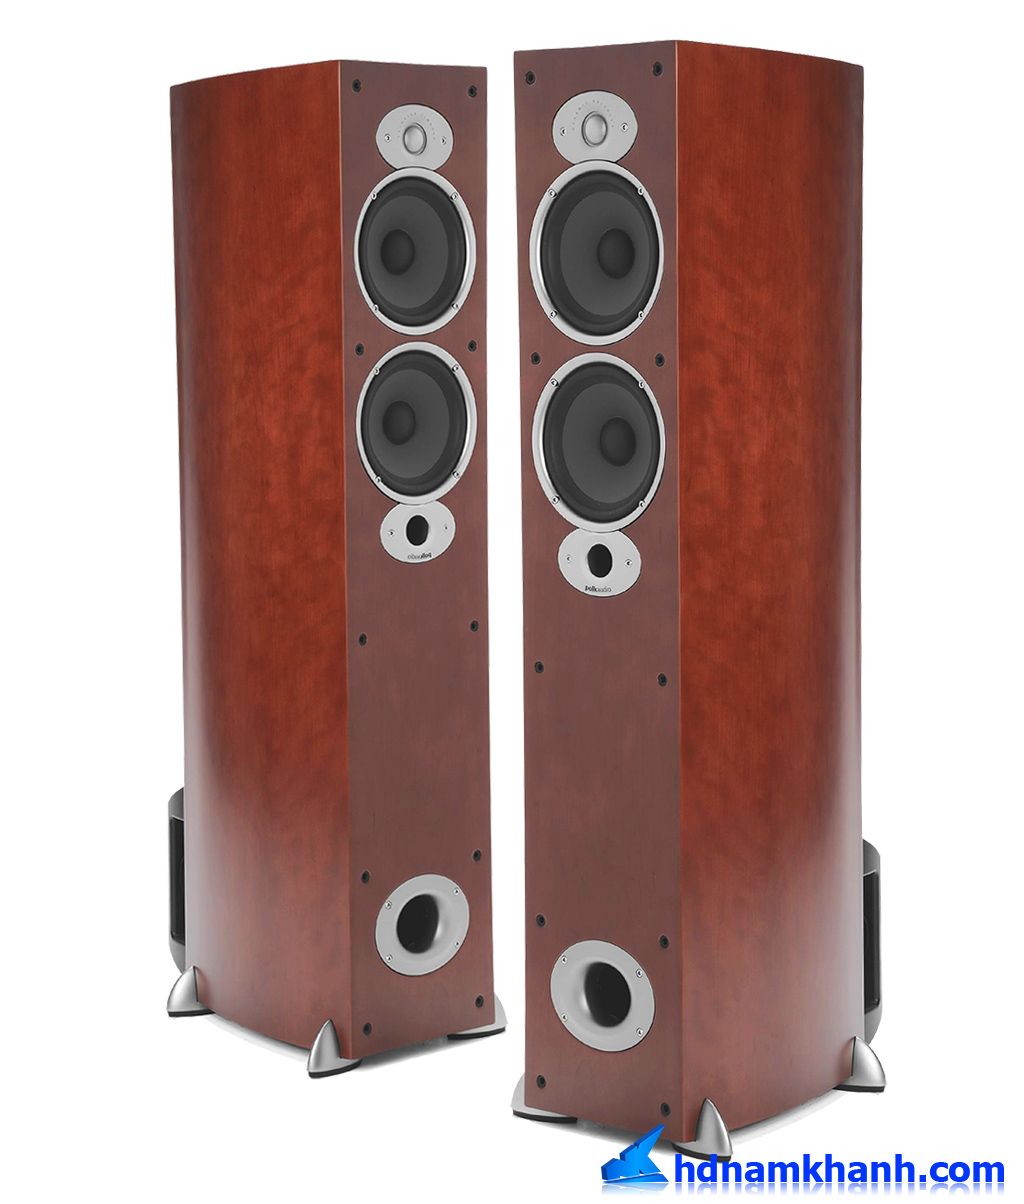 Amply Denon X1600H + Bộ Loa Polk Audio A5 rất sang trọng - 3